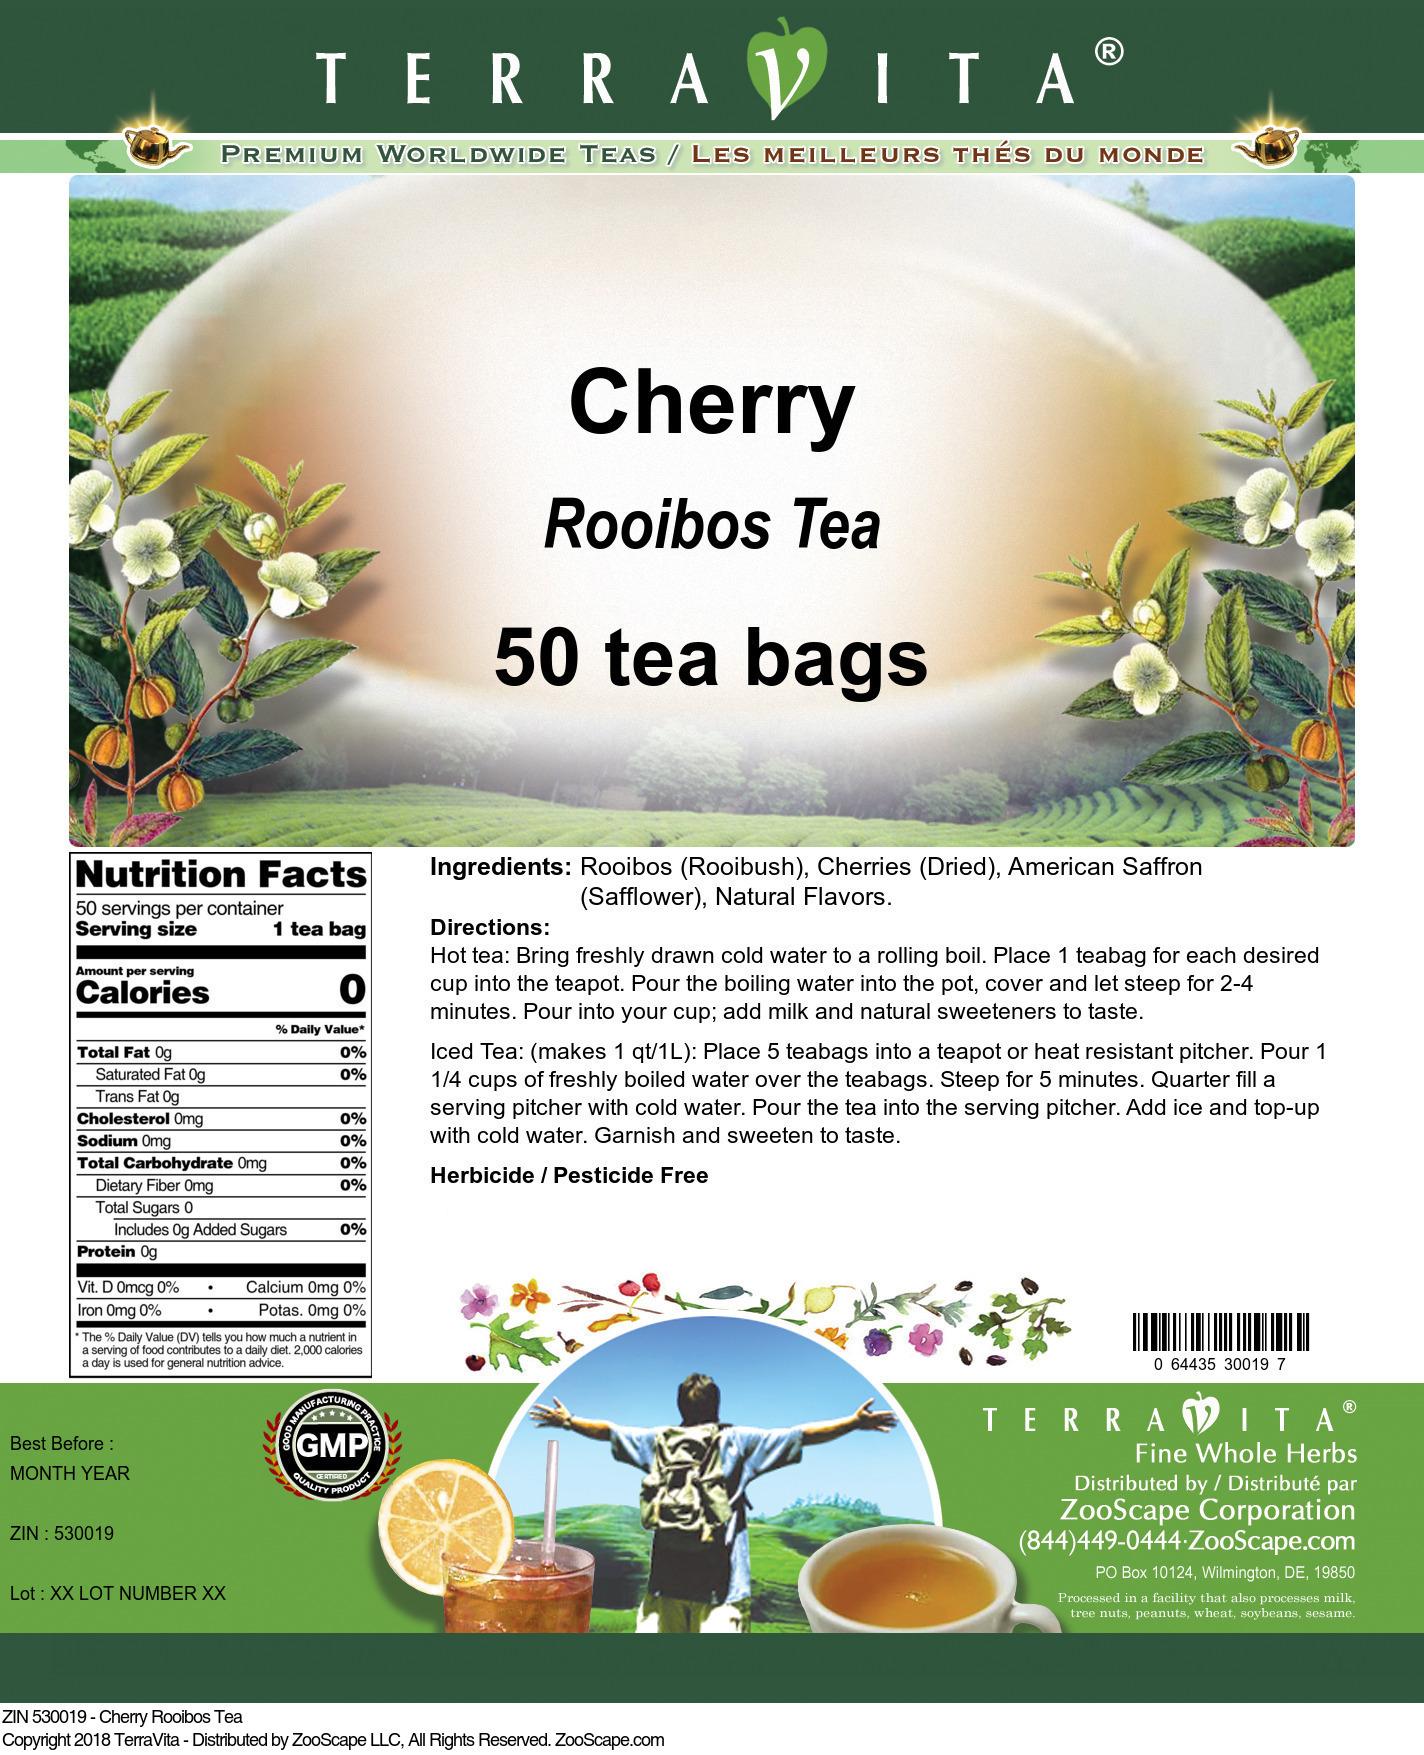 Cherry Rooibos Tea